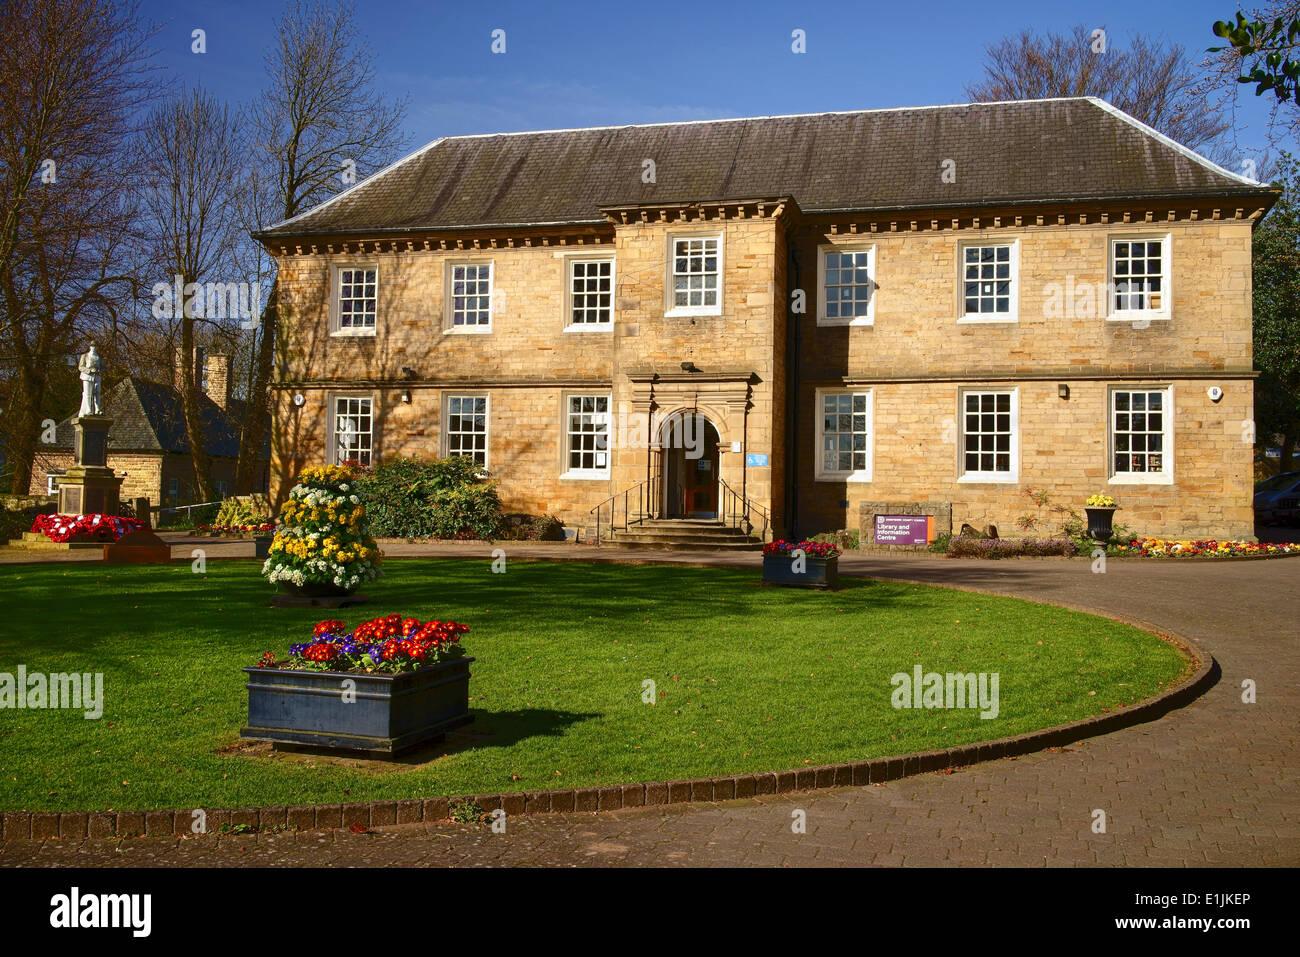 Sheffield Manor Stock Photos & Sheffield Manor Stock Images - Alamy